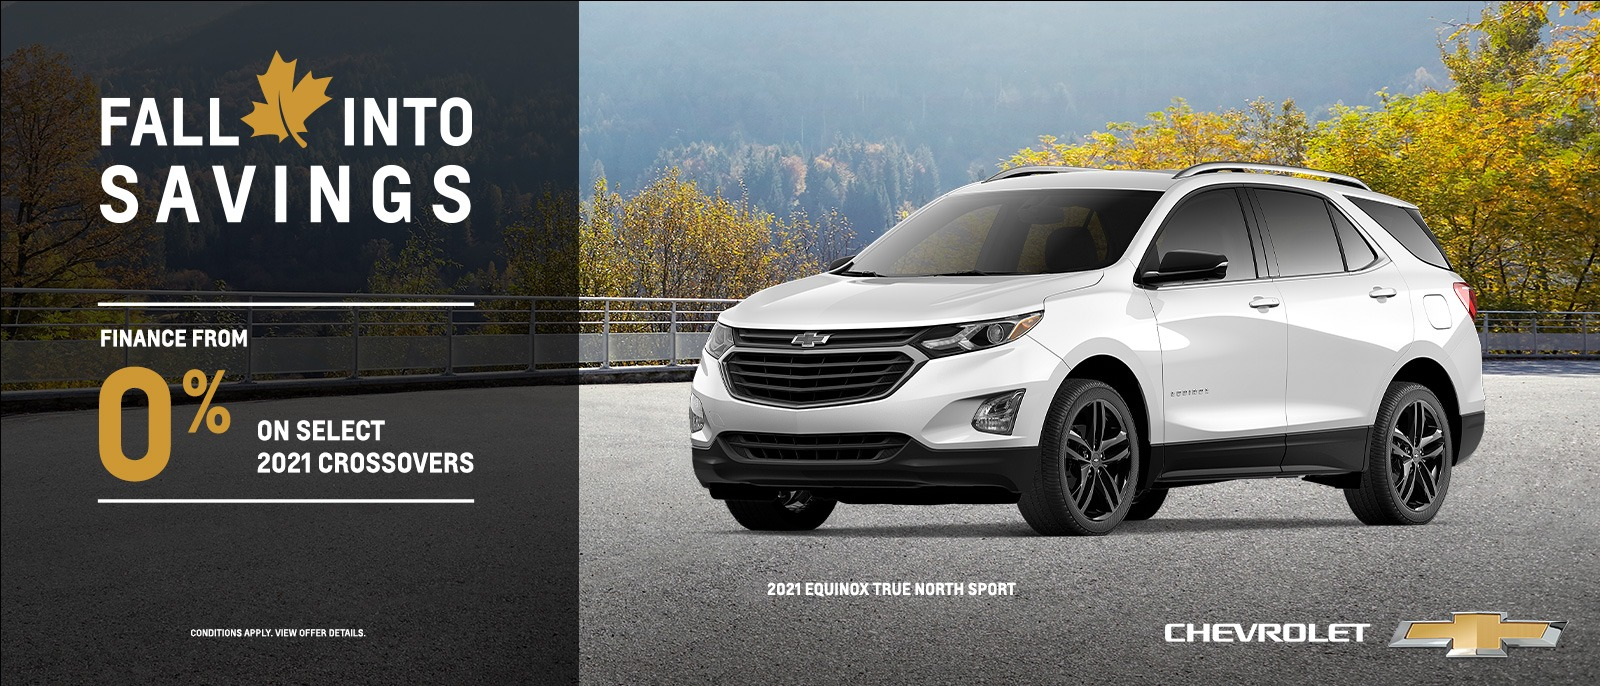 Fall Into Savings – 2021 Chevrolet Family